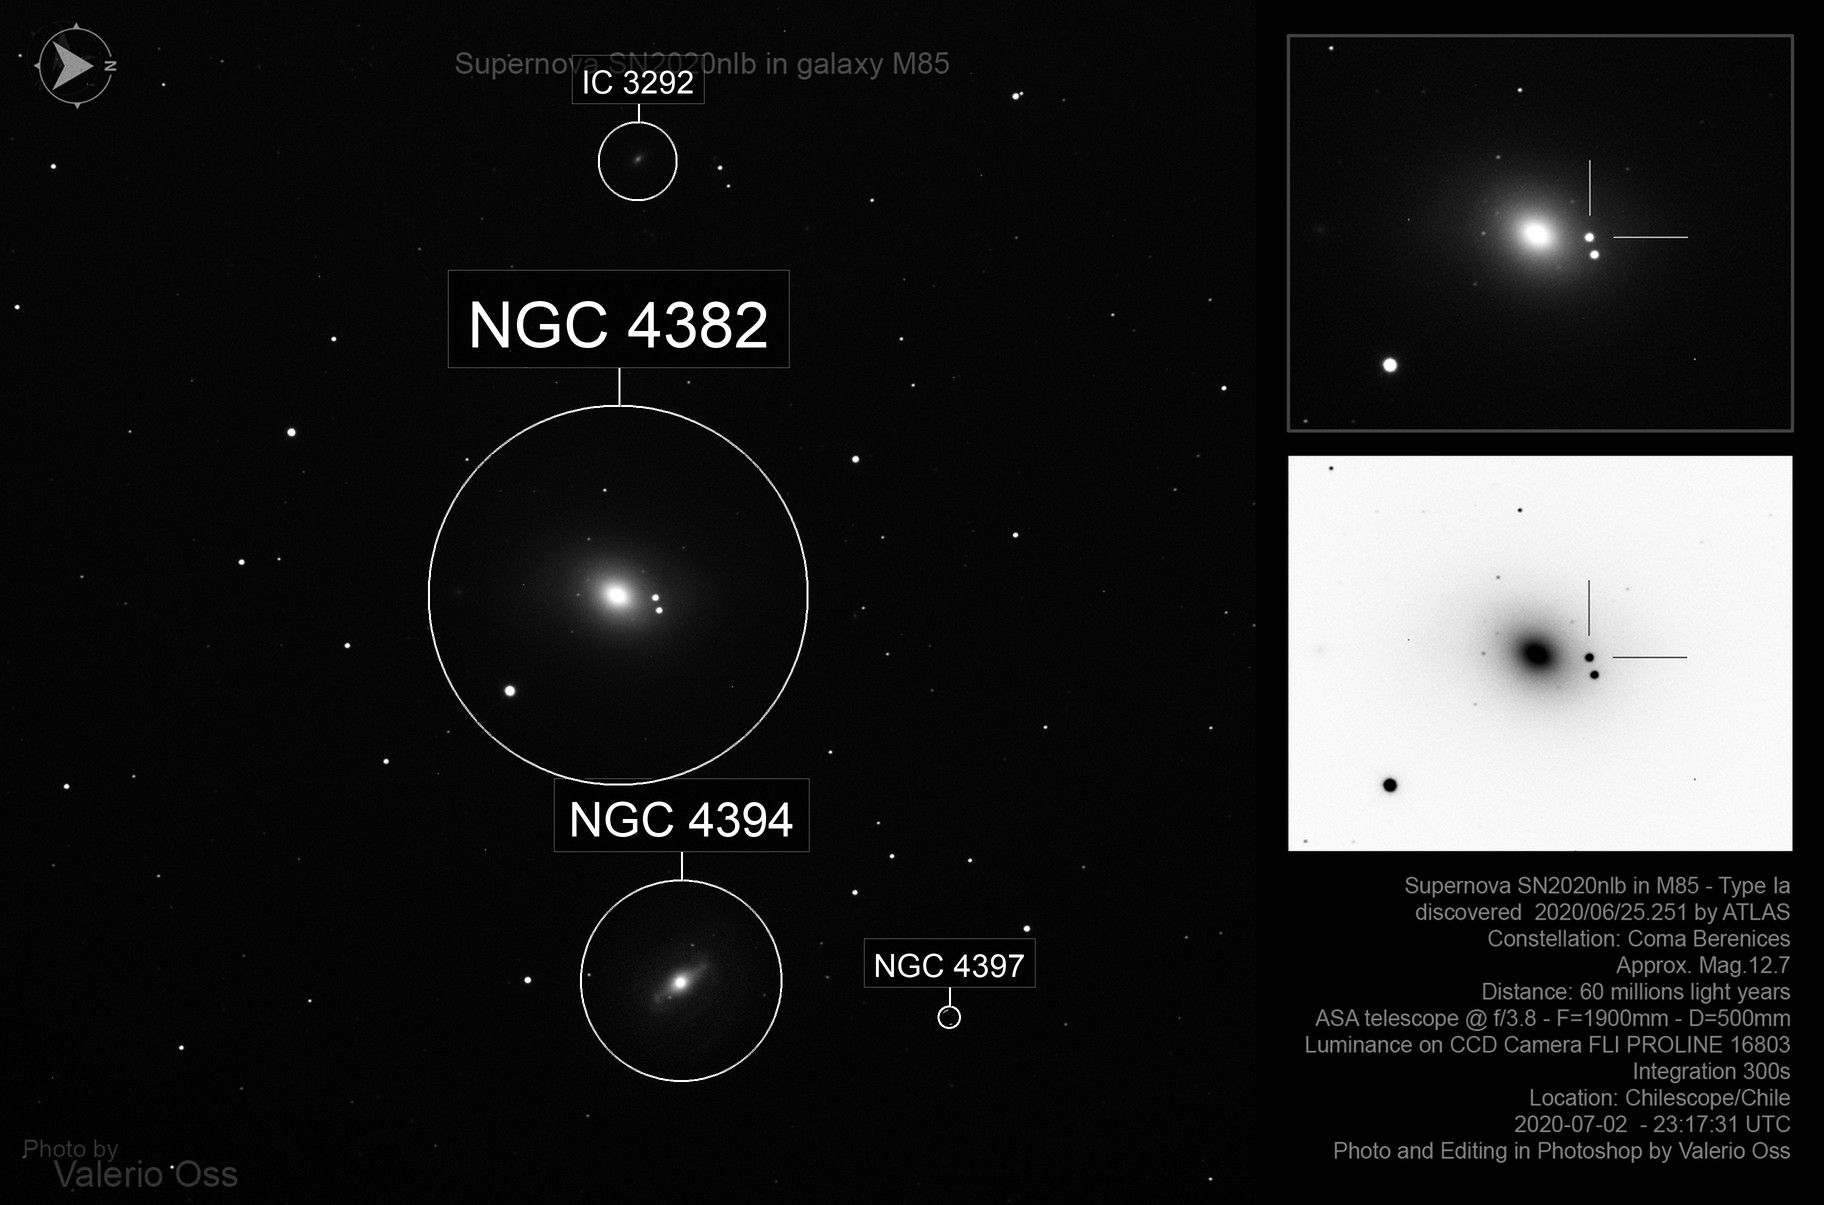 Supernova SN2020nlb in galaxy M85